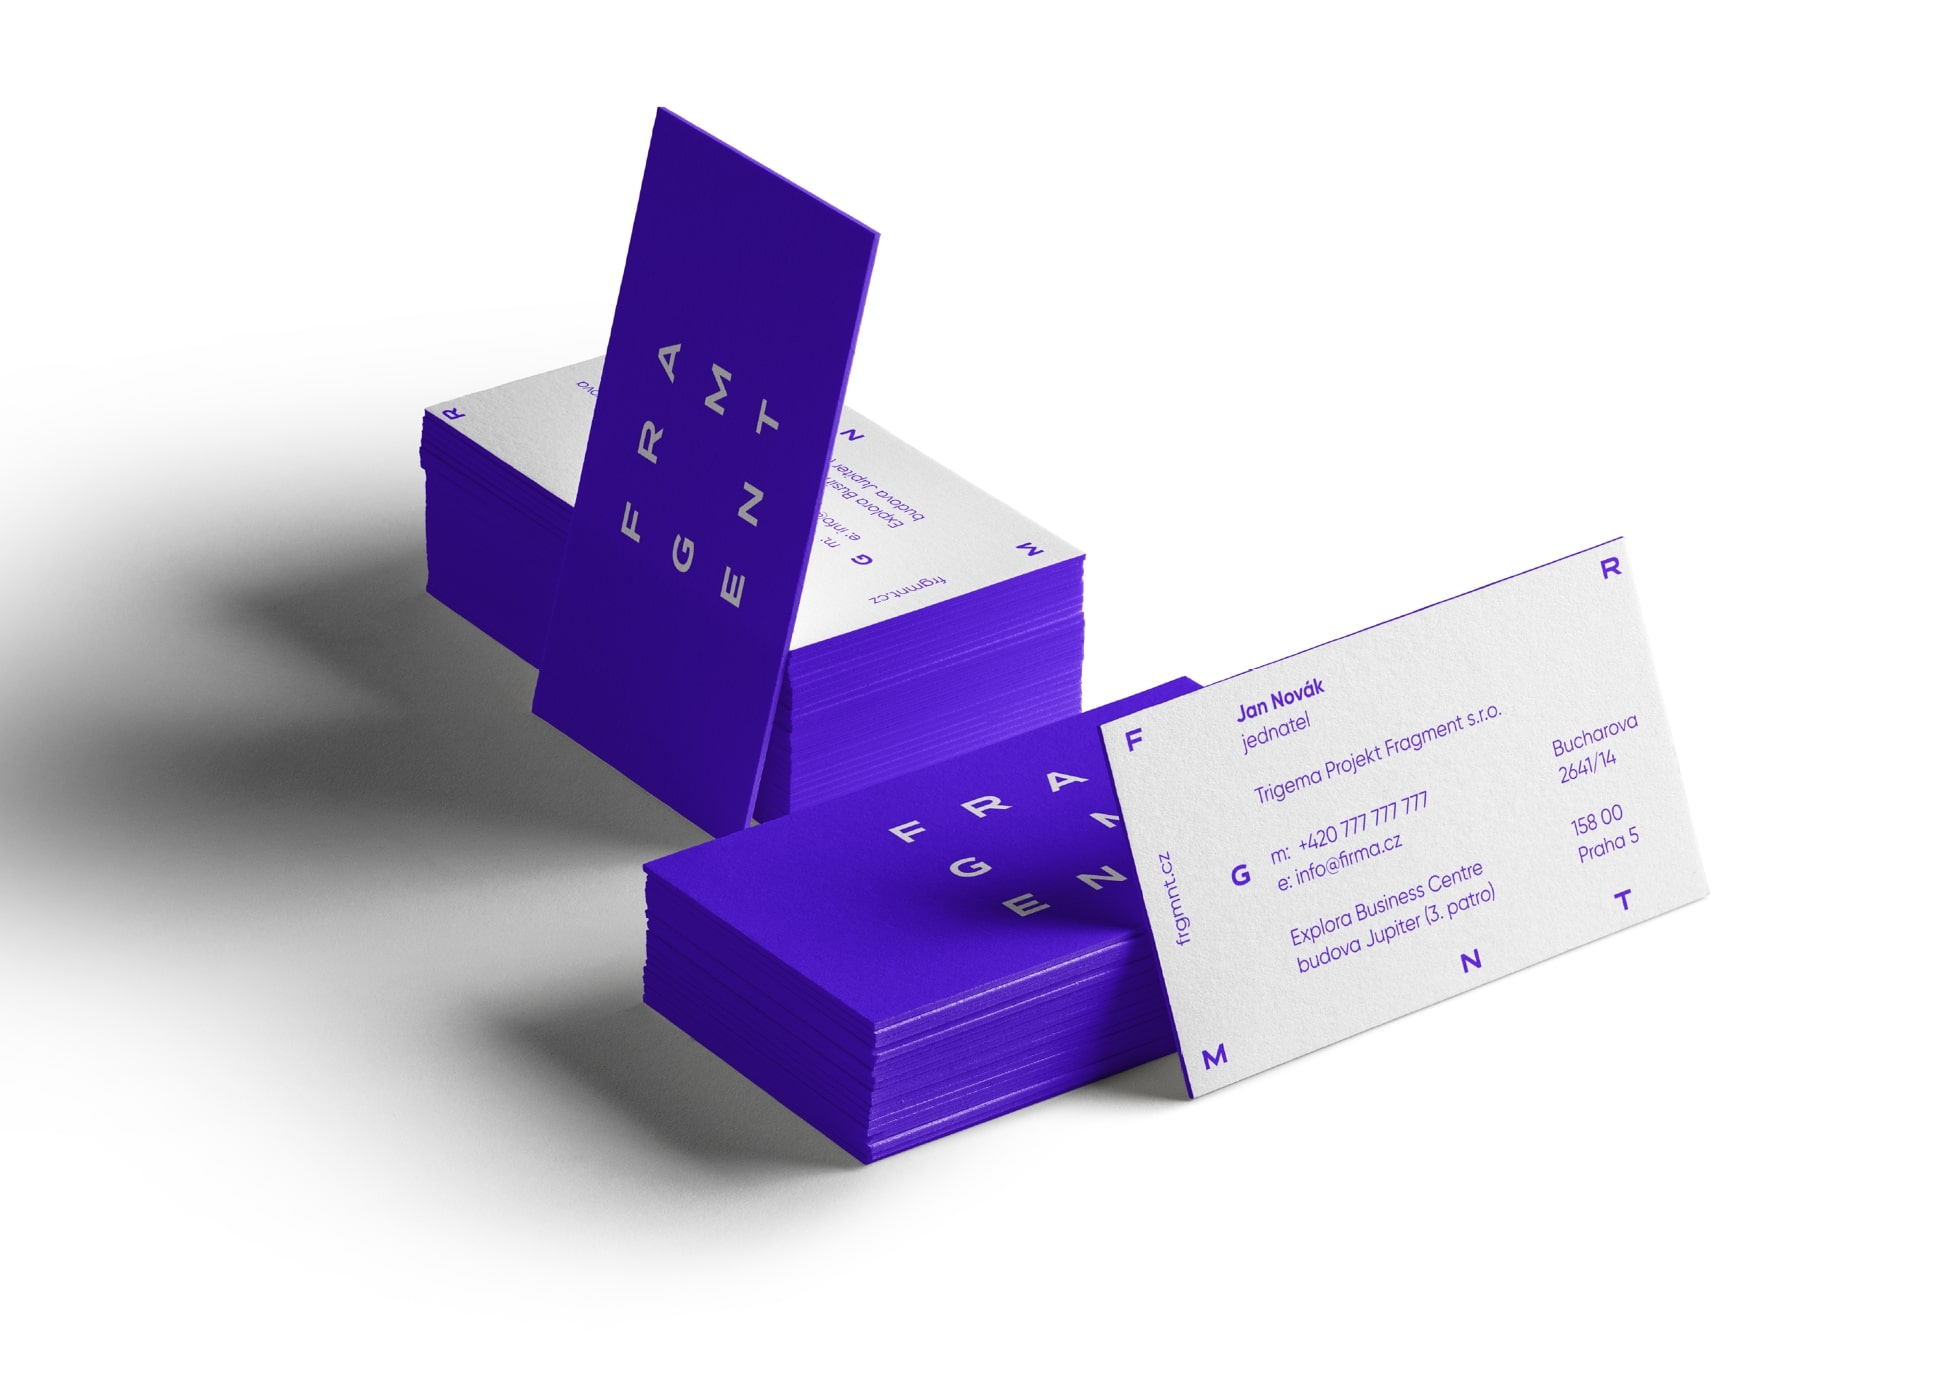 residential_fragmnt_business_cards